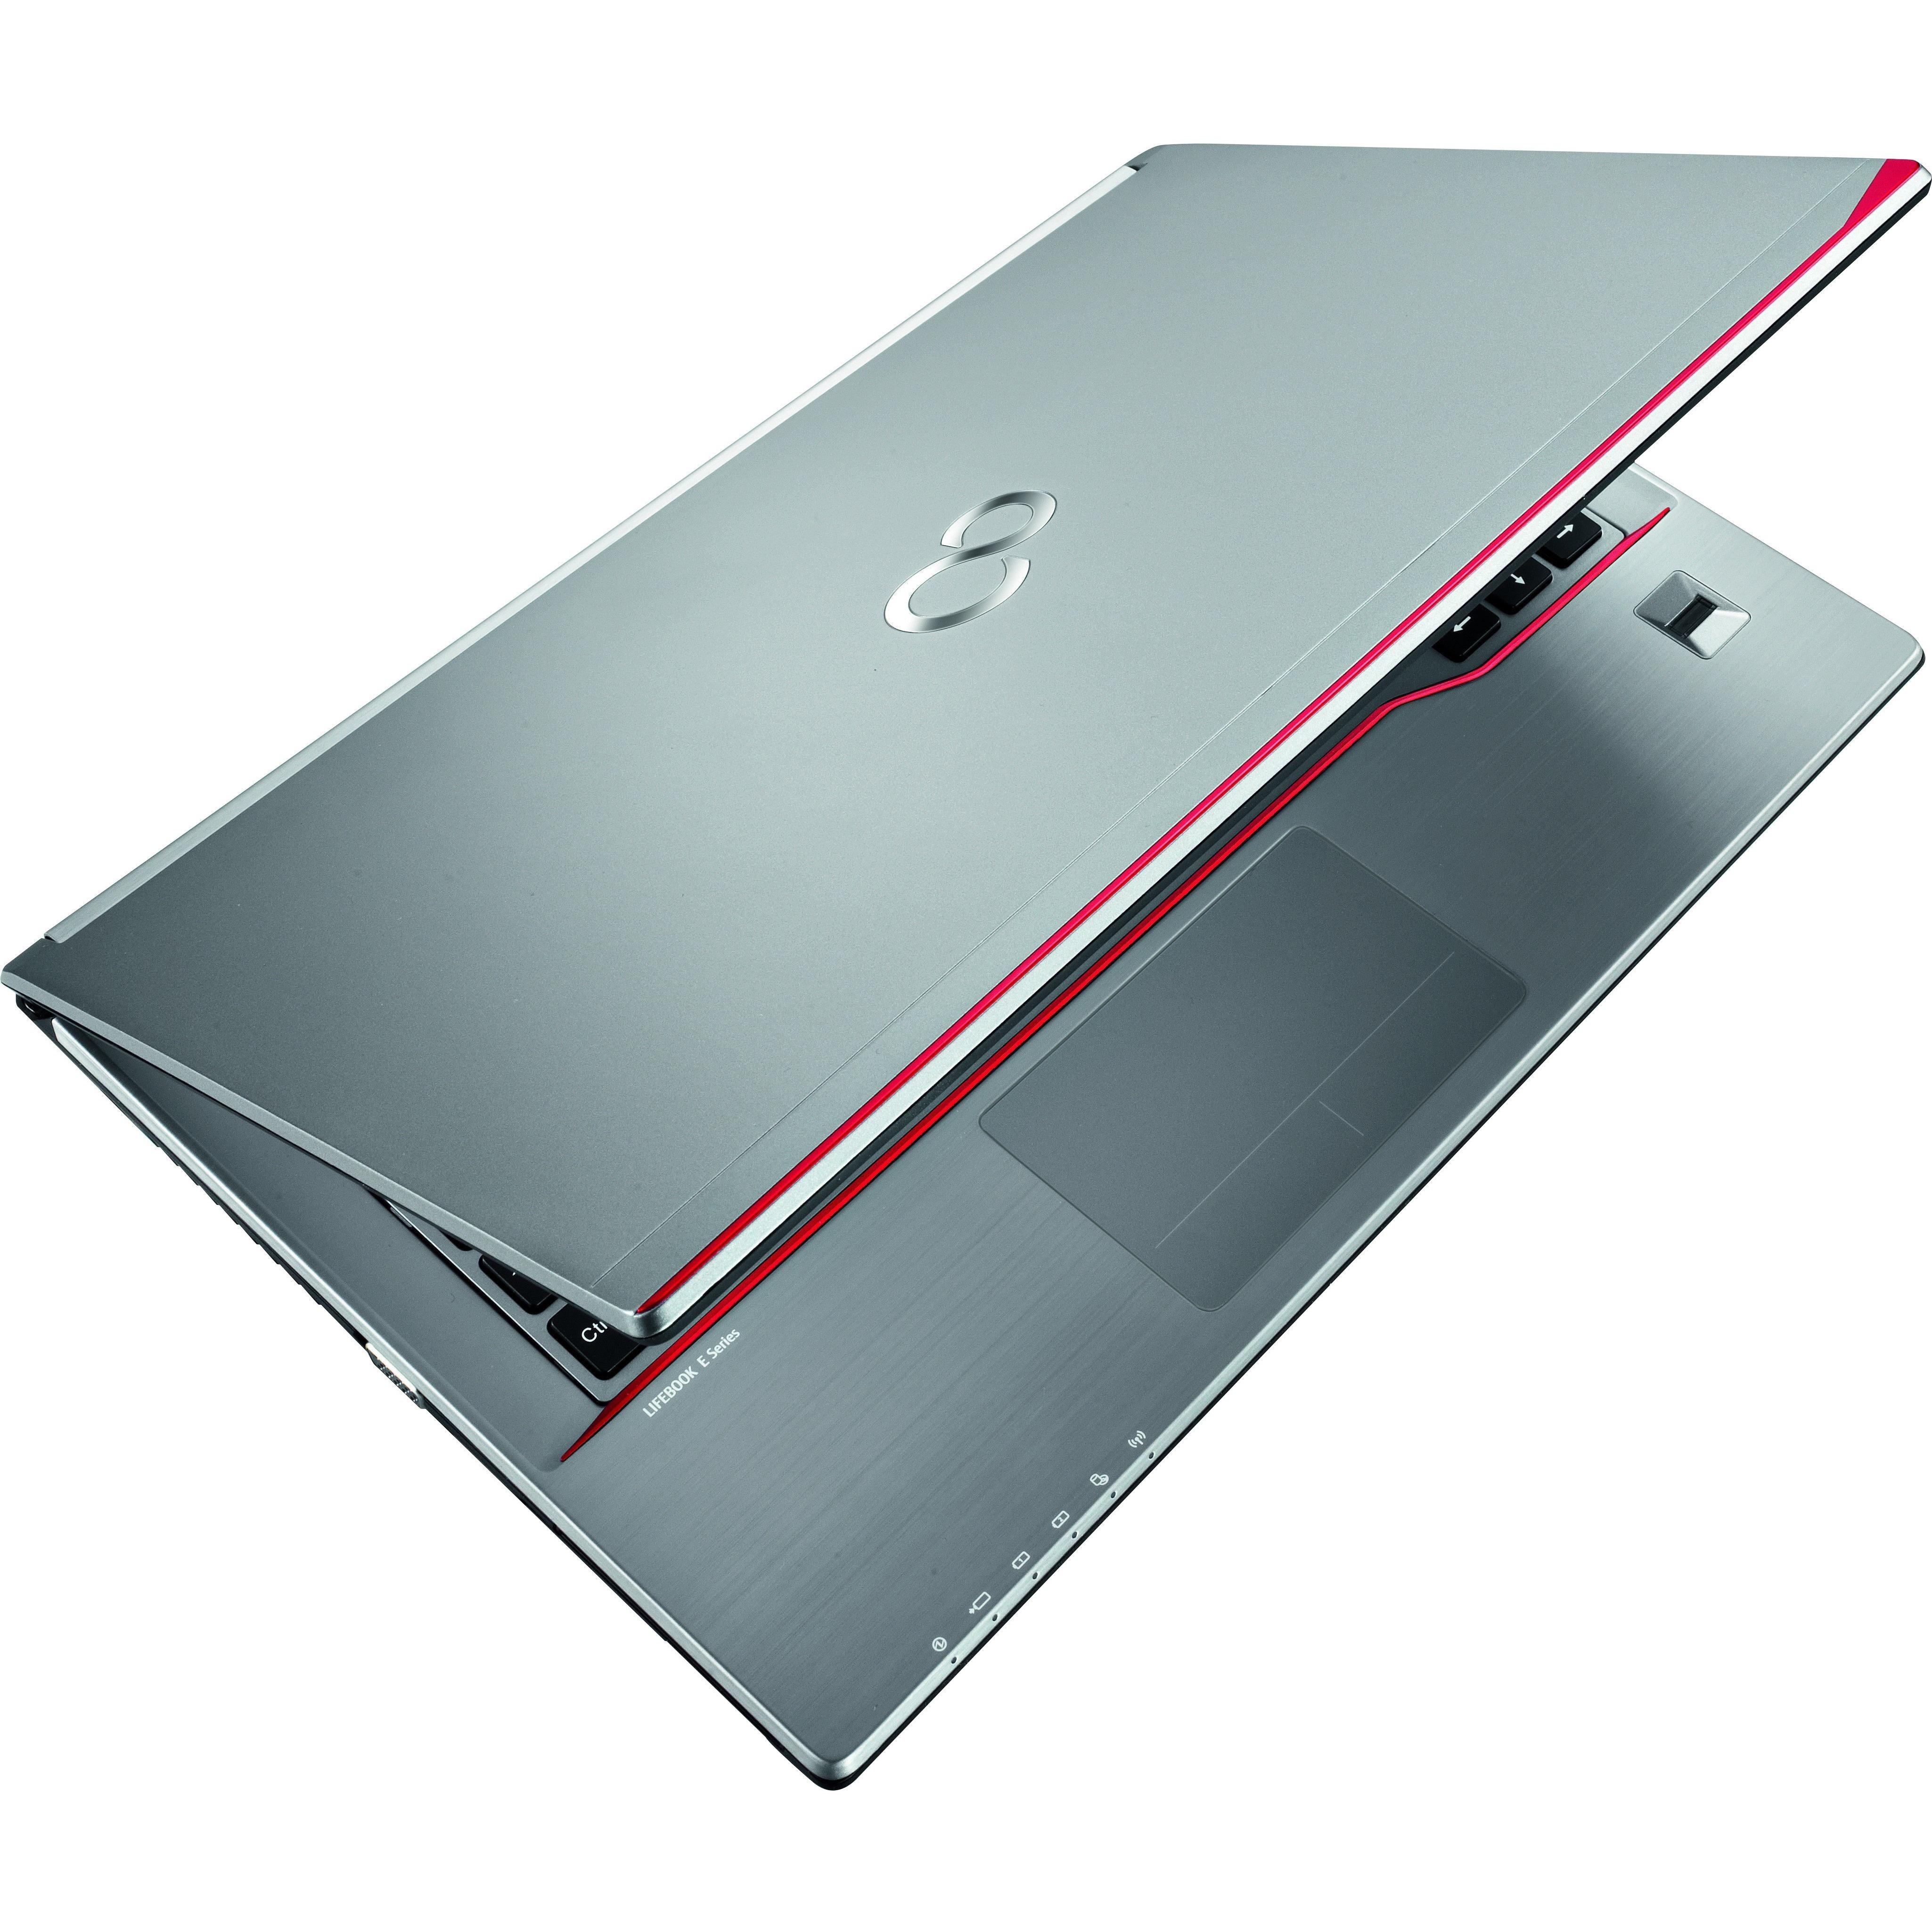 Fujitsu LIFEBOOK E736 33.8 cm 13.3inch LCD Notebook - Intel Core i5 6th Gen i5-6200U Dual-core 2 Core 2.30 GHz - 8 GB DDR4 SDRAM - 256 GB SSD - Windows 10 Pro 64-